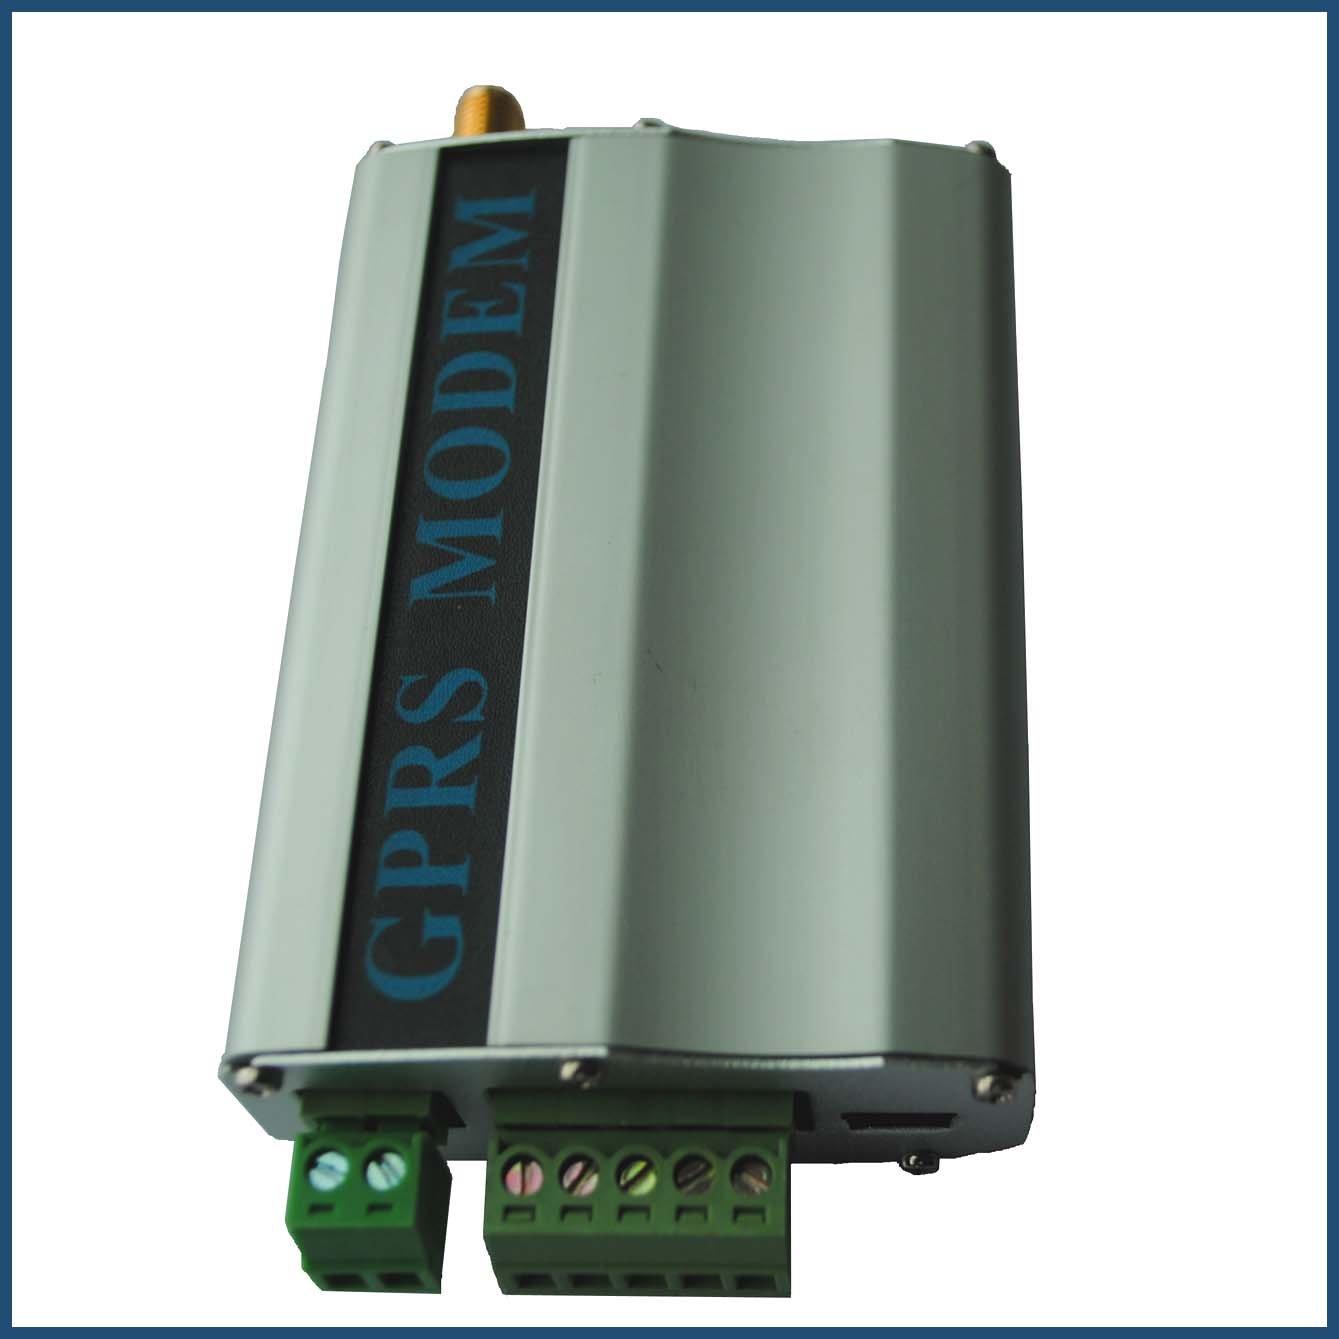 Linkto-MC52I-RS485-GPRS MODEM